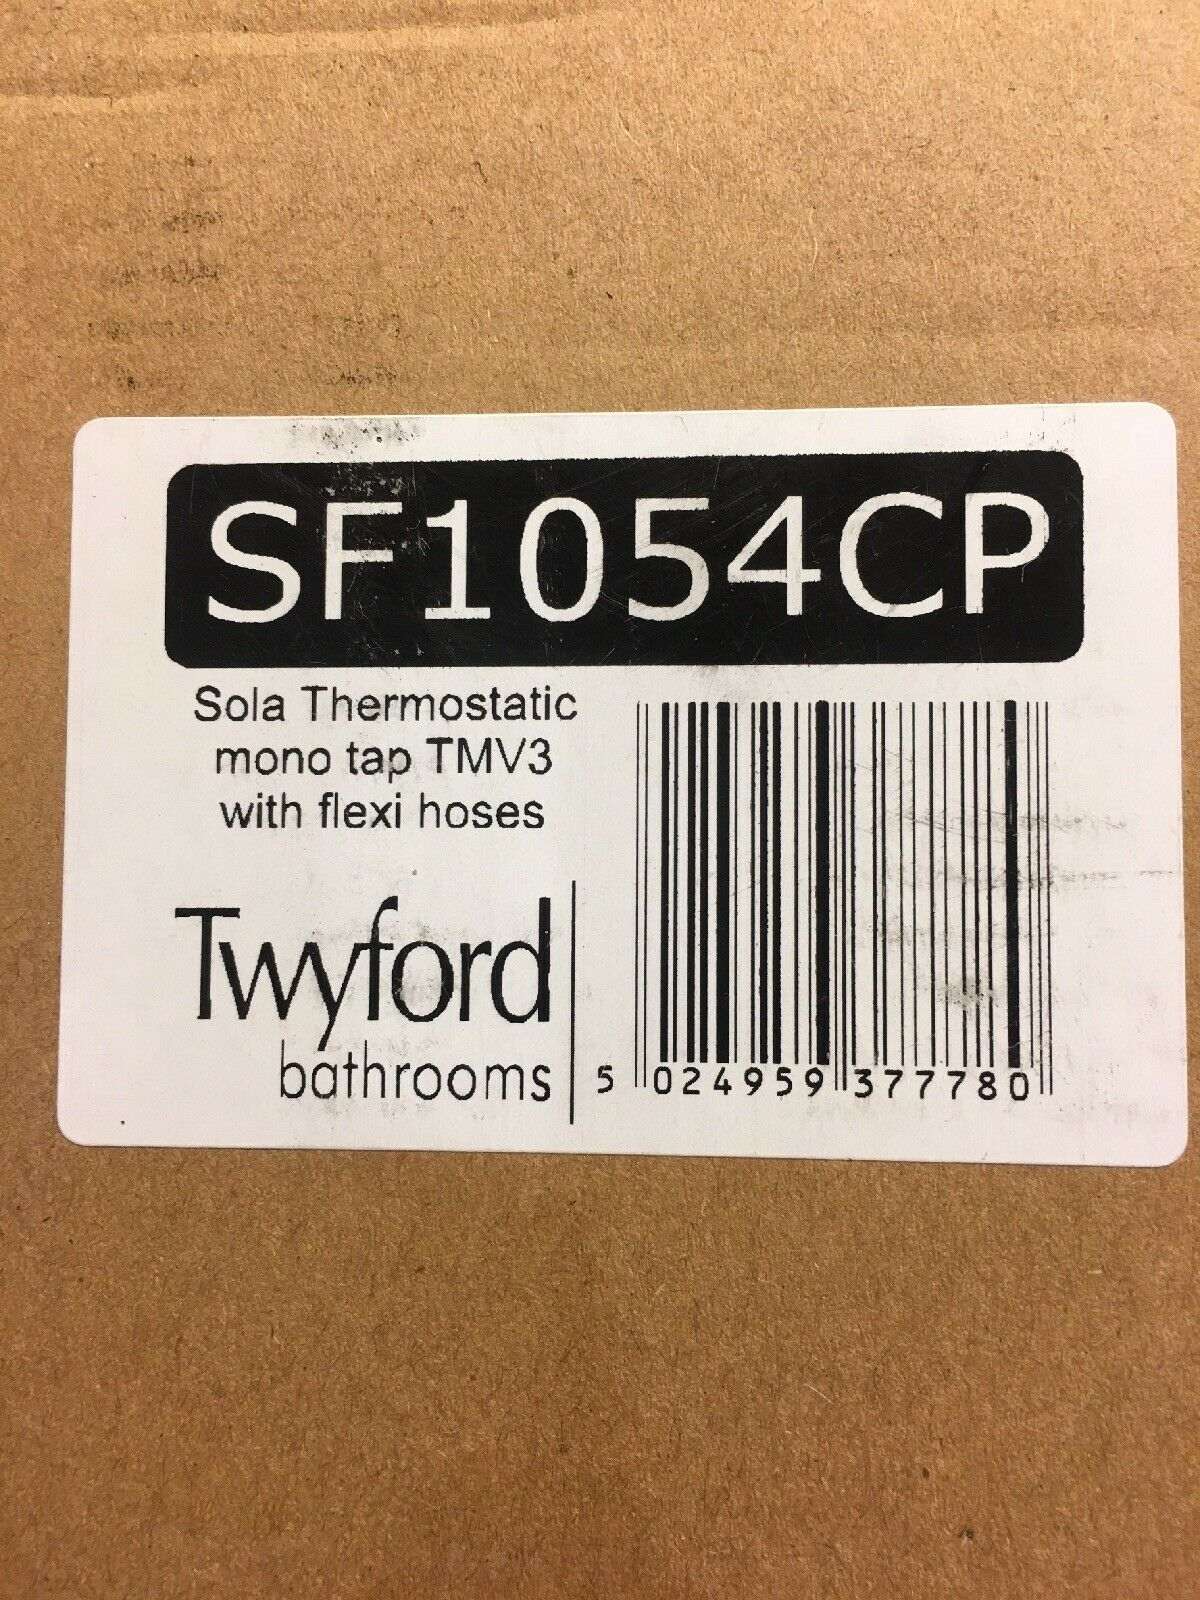 TWYFORDS Sola thermostatique (TMV3) mono bassin mitigeur, avec Flexi tuyaux